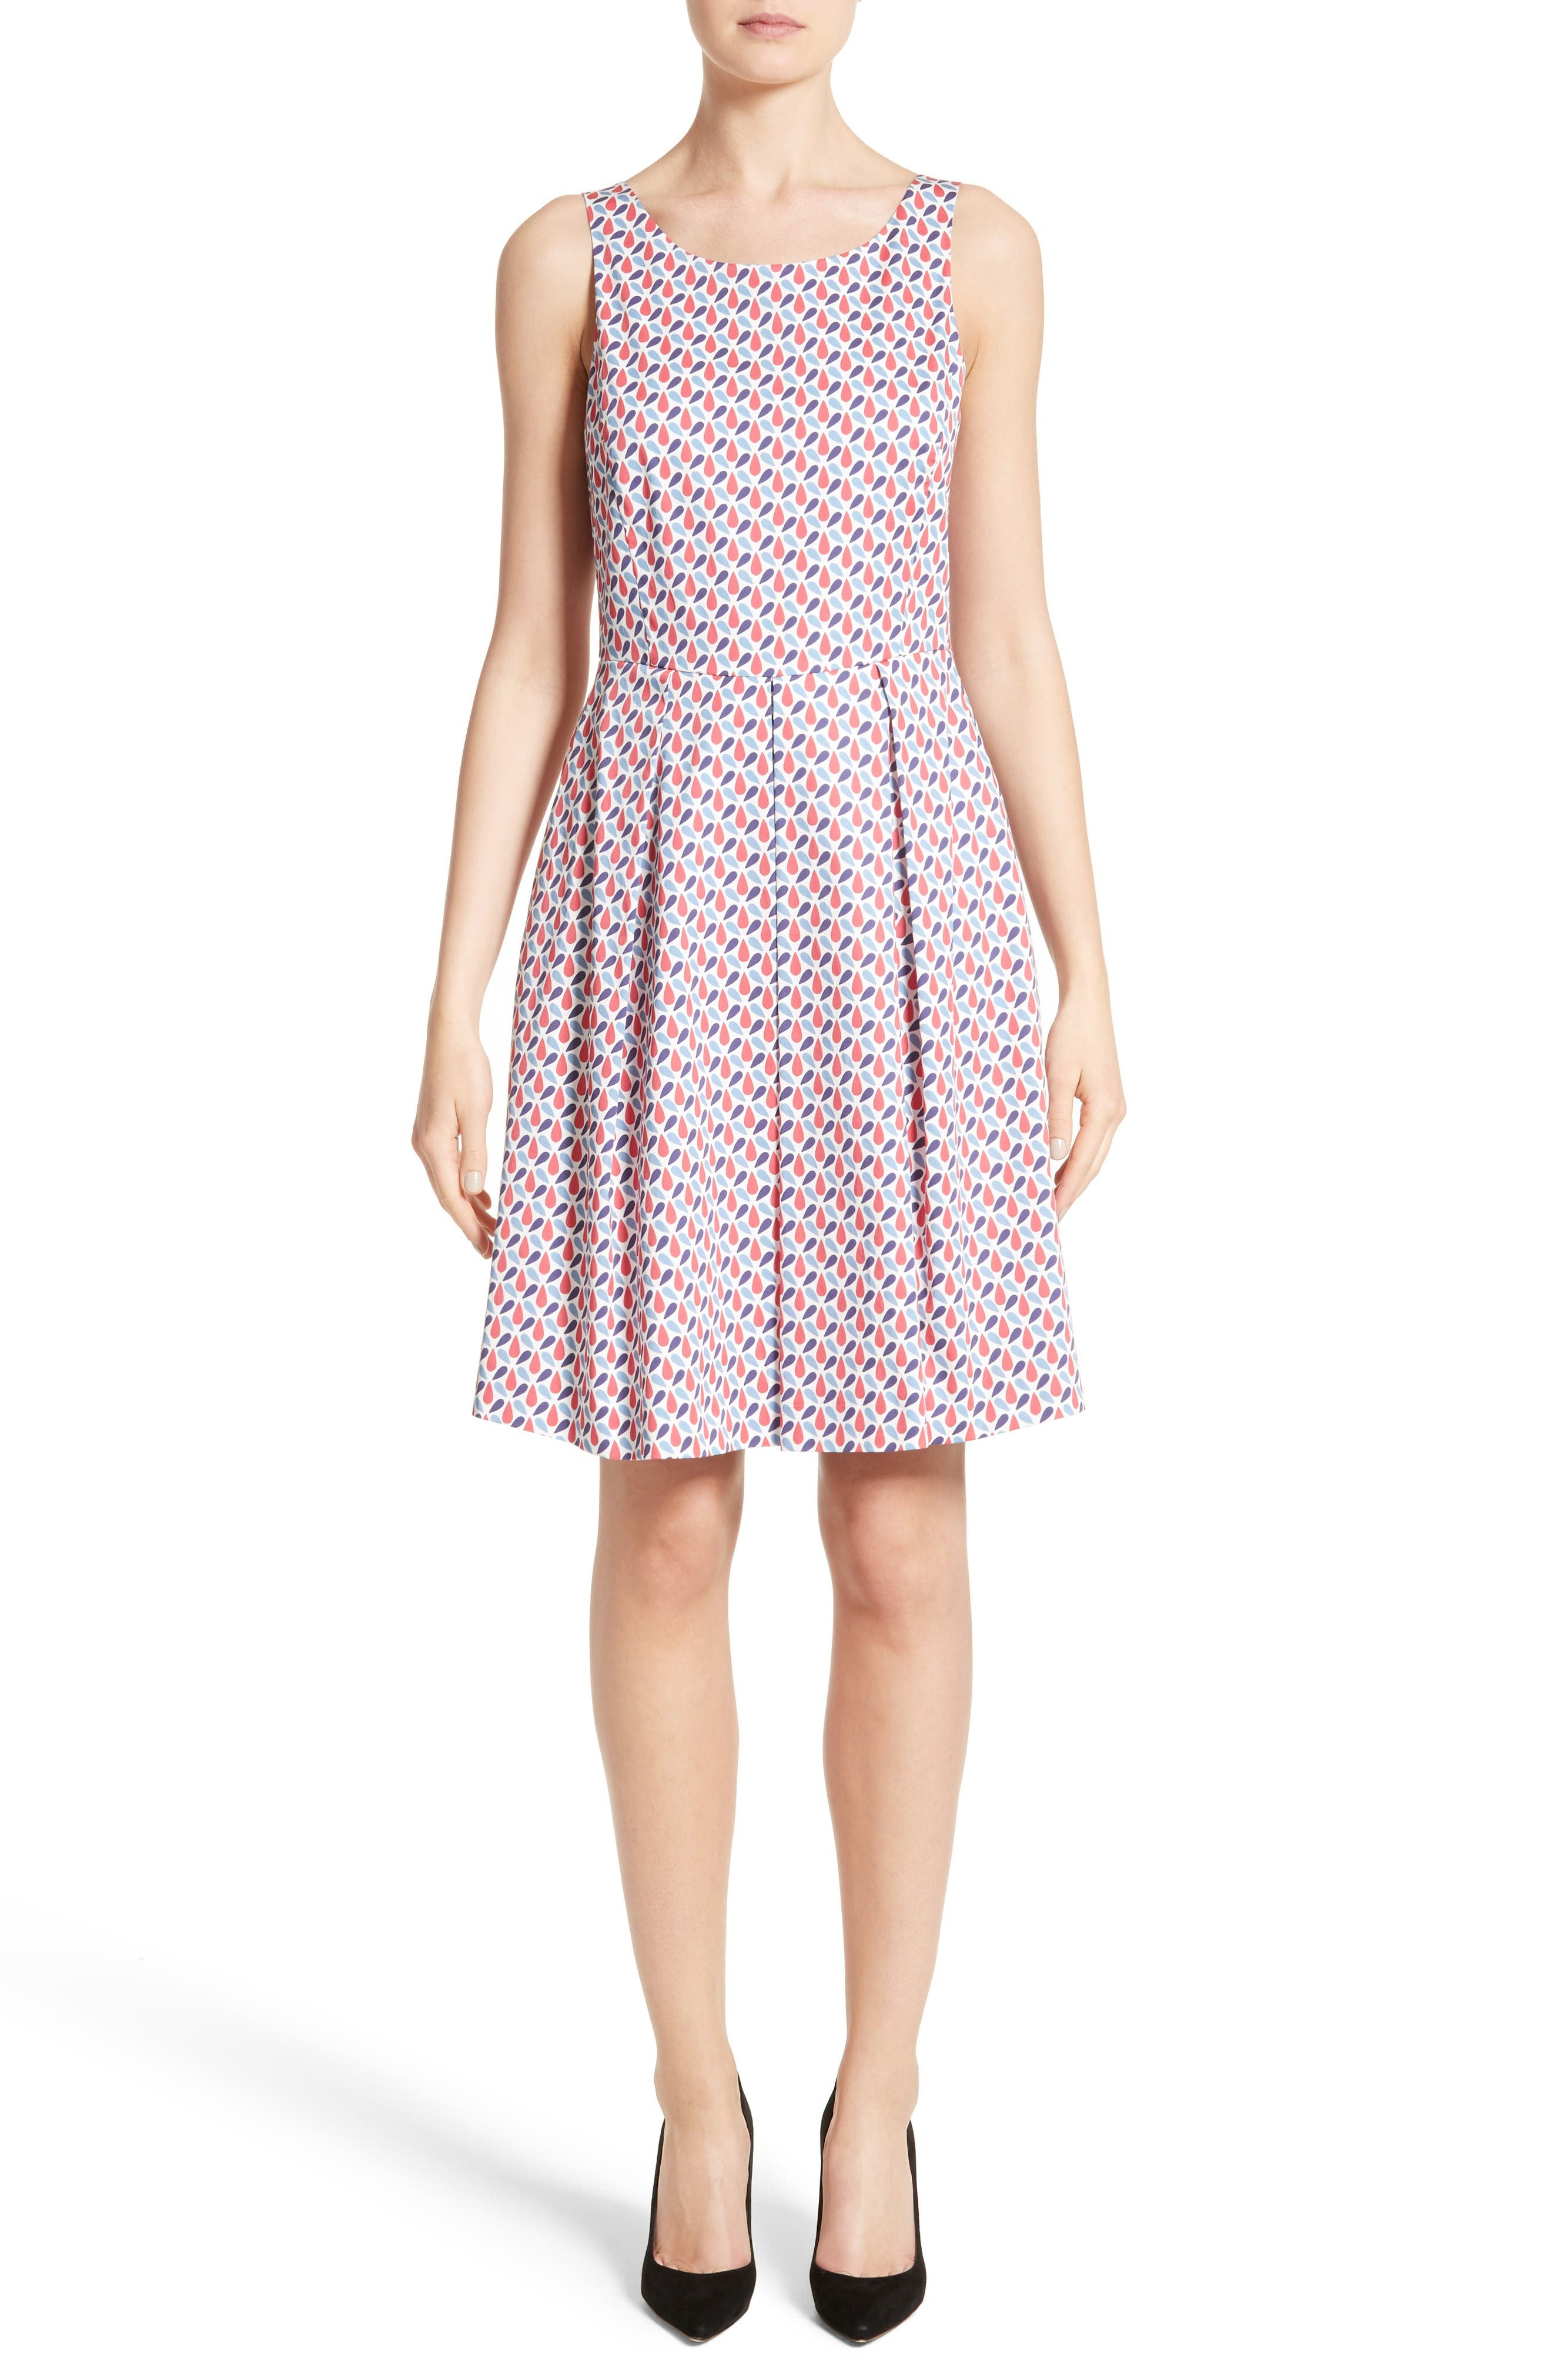 Alternate Image 1 Selected - Armani Collezioni Print Cotton Fit & Flair Dress